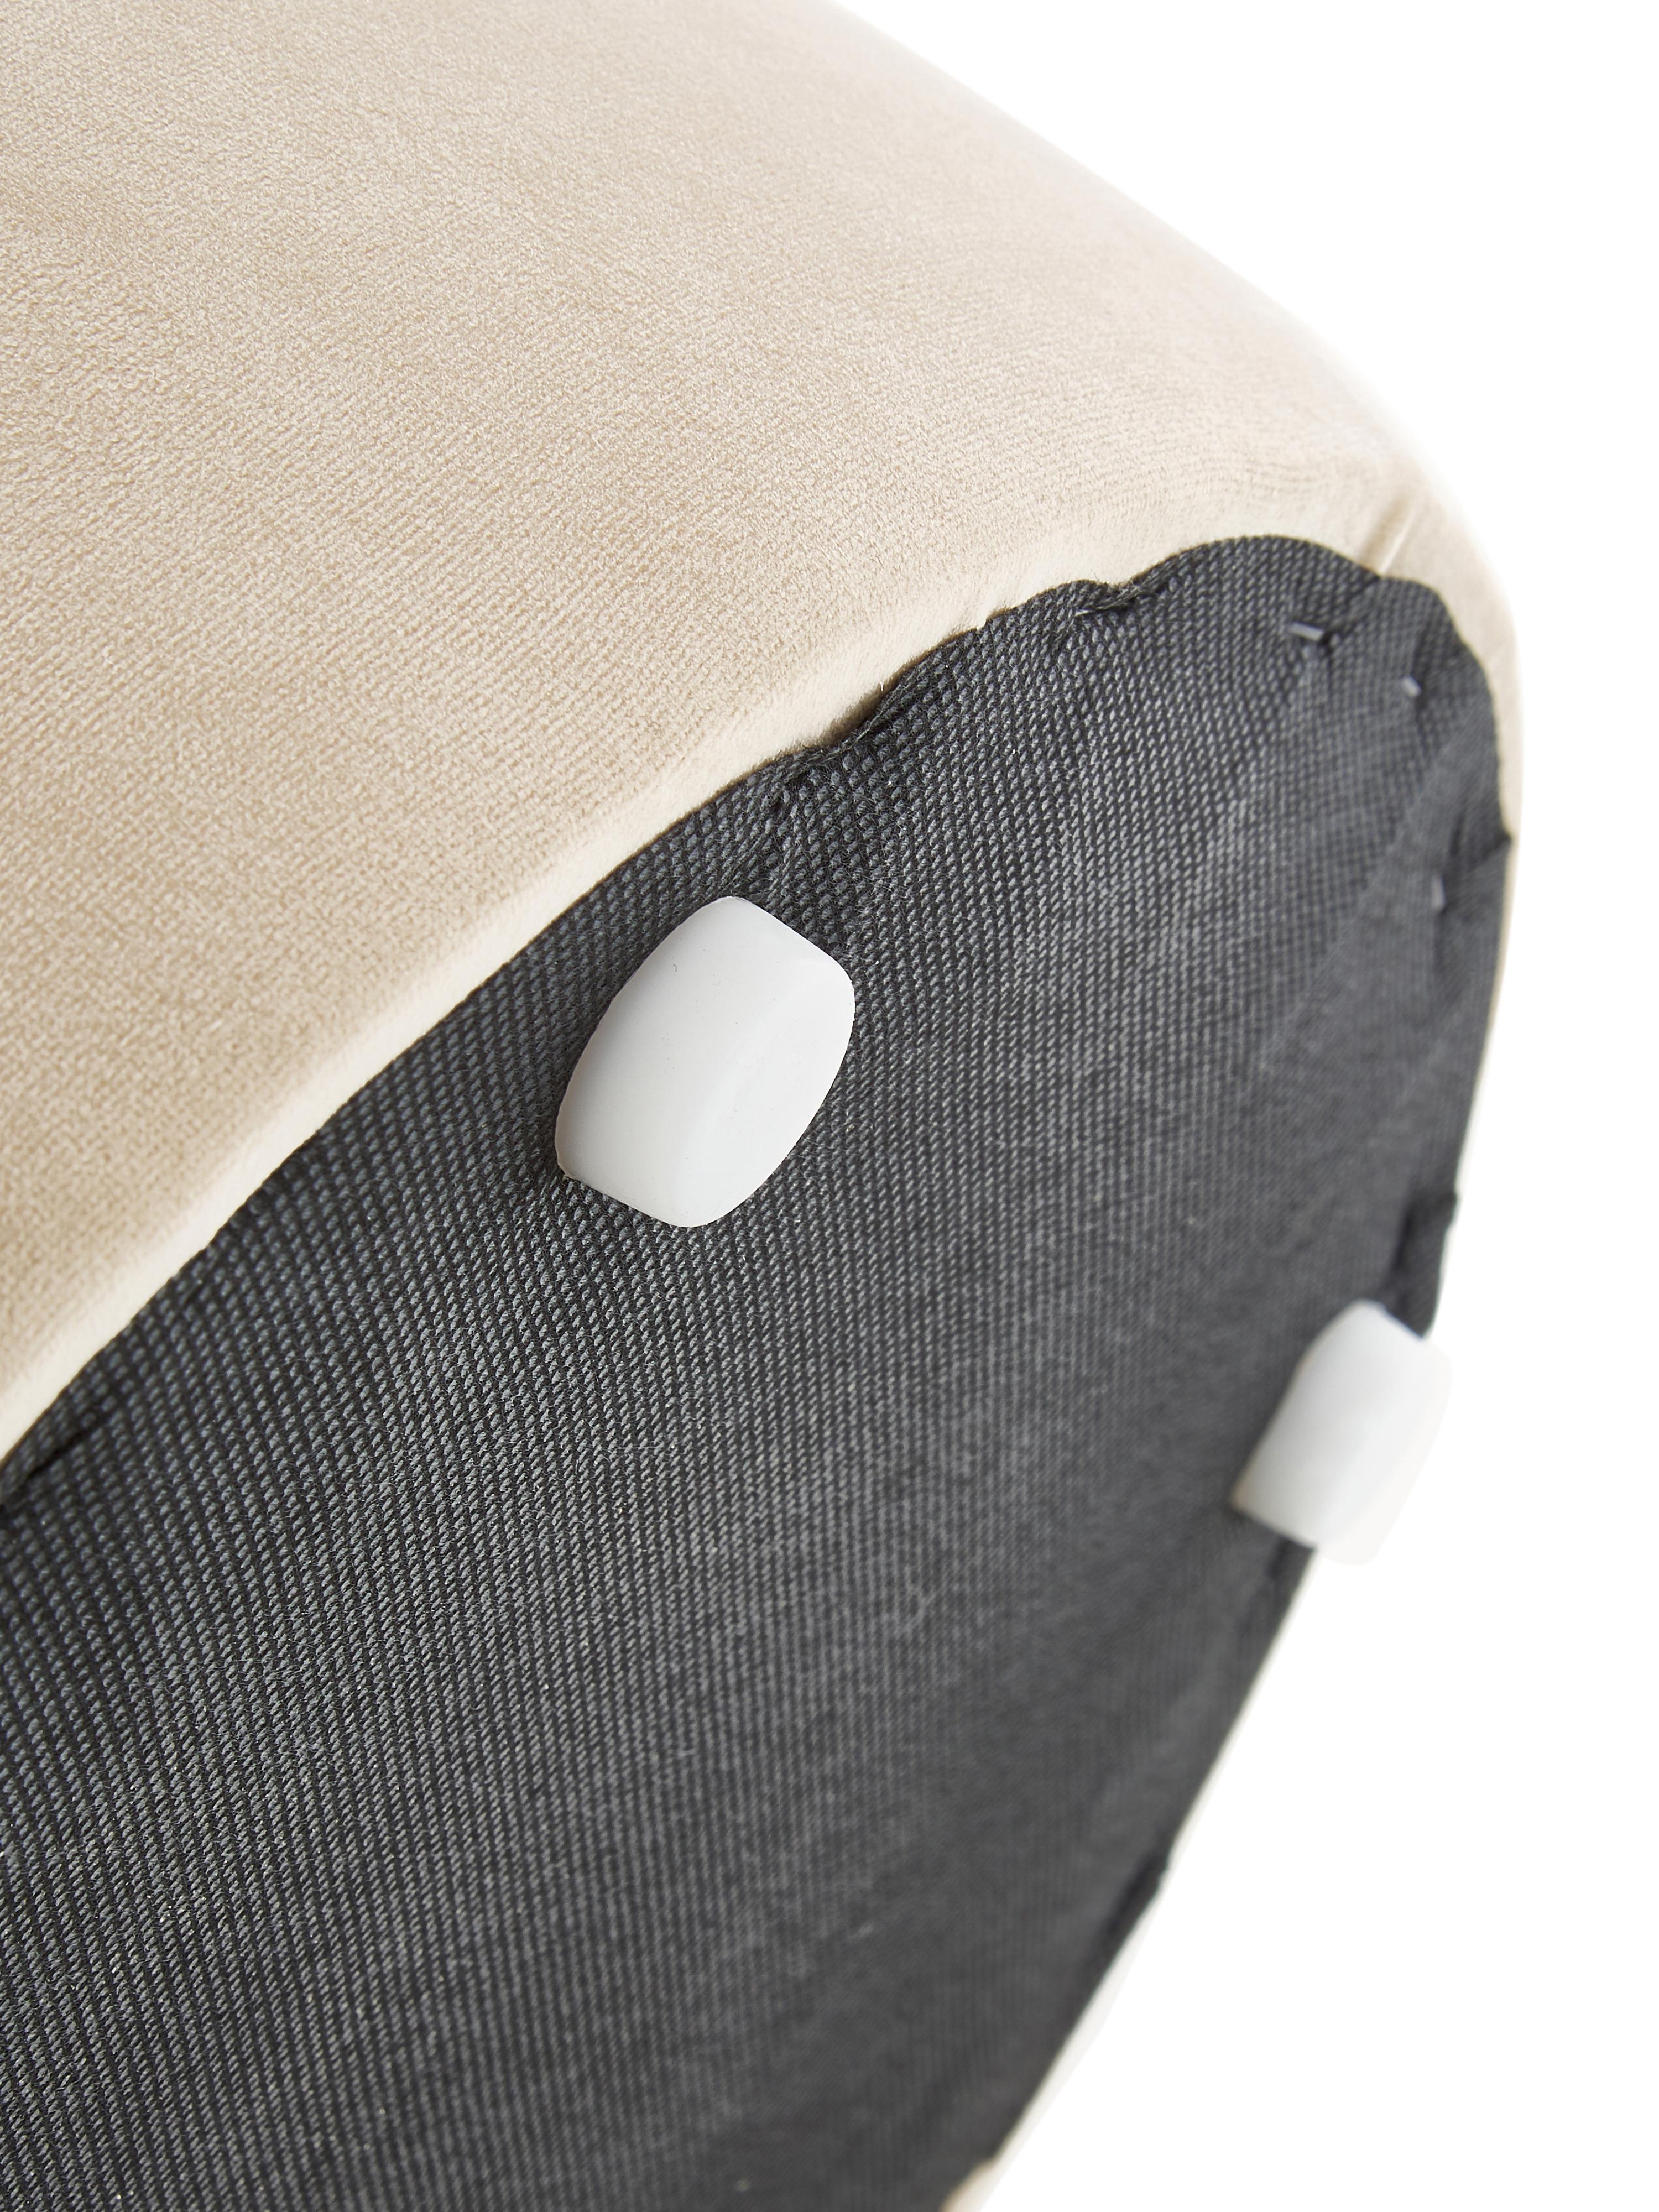 Samt-Hocker Daisy, Bezug: Samt (Polyester) 25.000 S, Rahmen: Sperrholz, Samt Beige, Ø 38 x H 45 cm